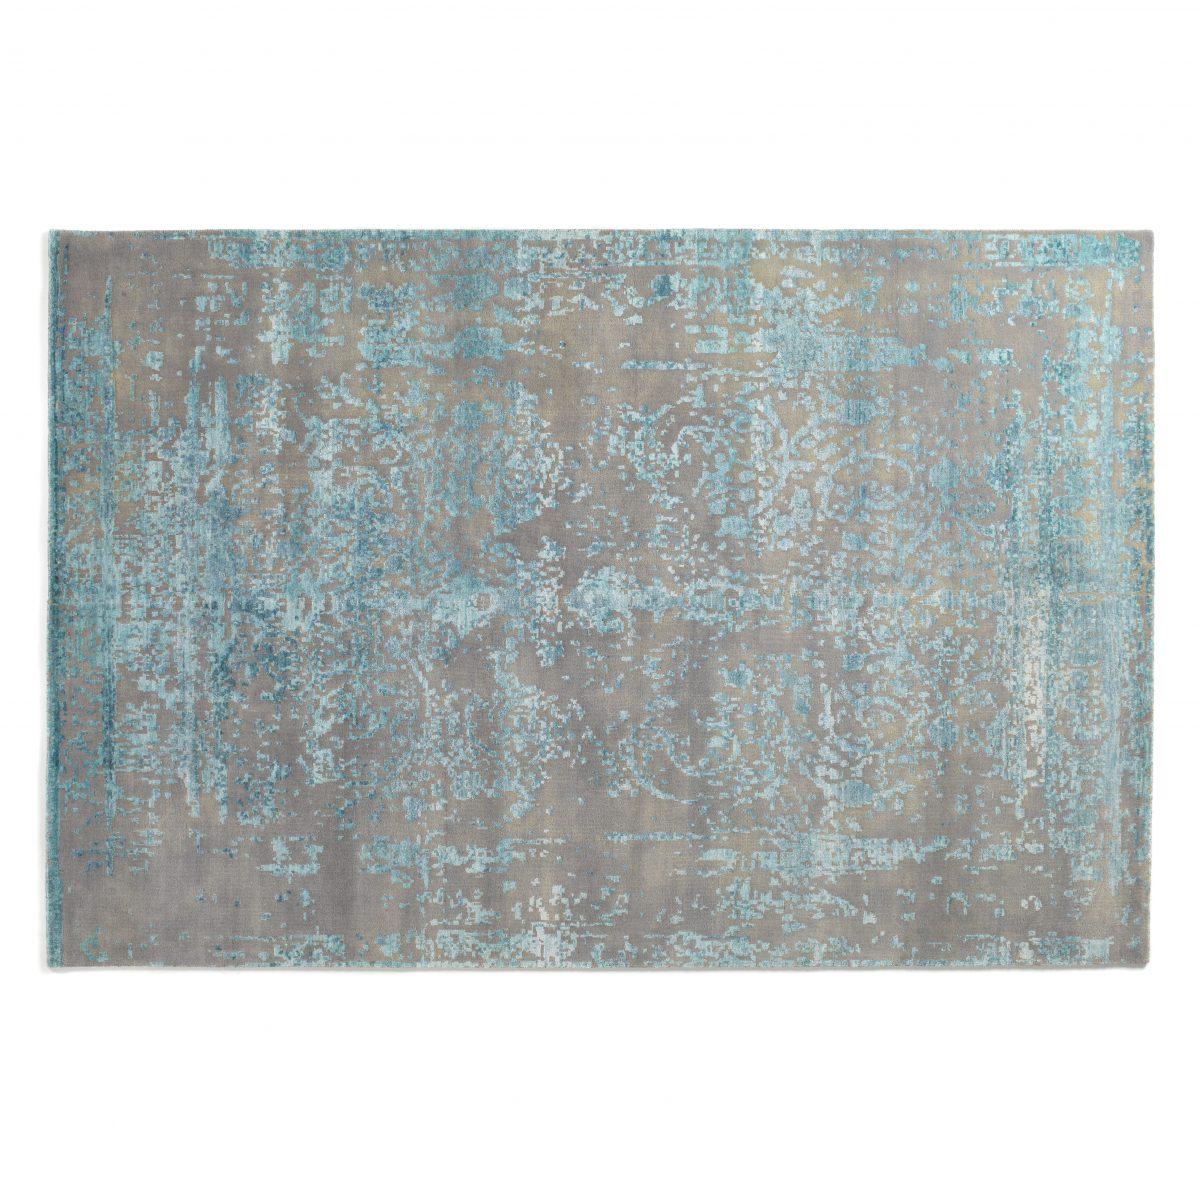 Patagonia Teal Blue